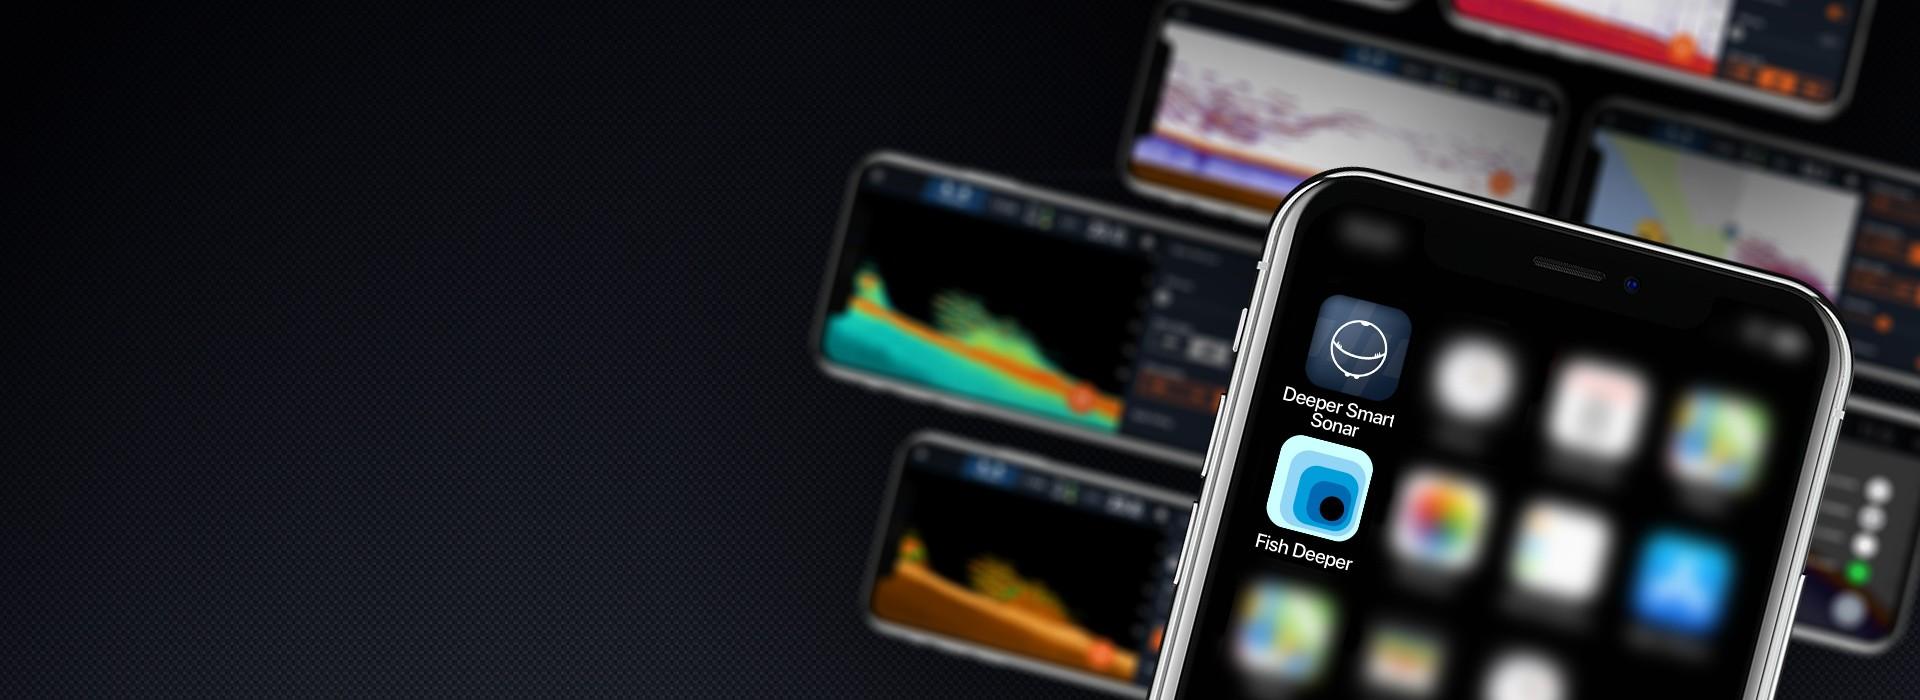 Deeper アプリ2つのアプリ。無限の釣りの可能性